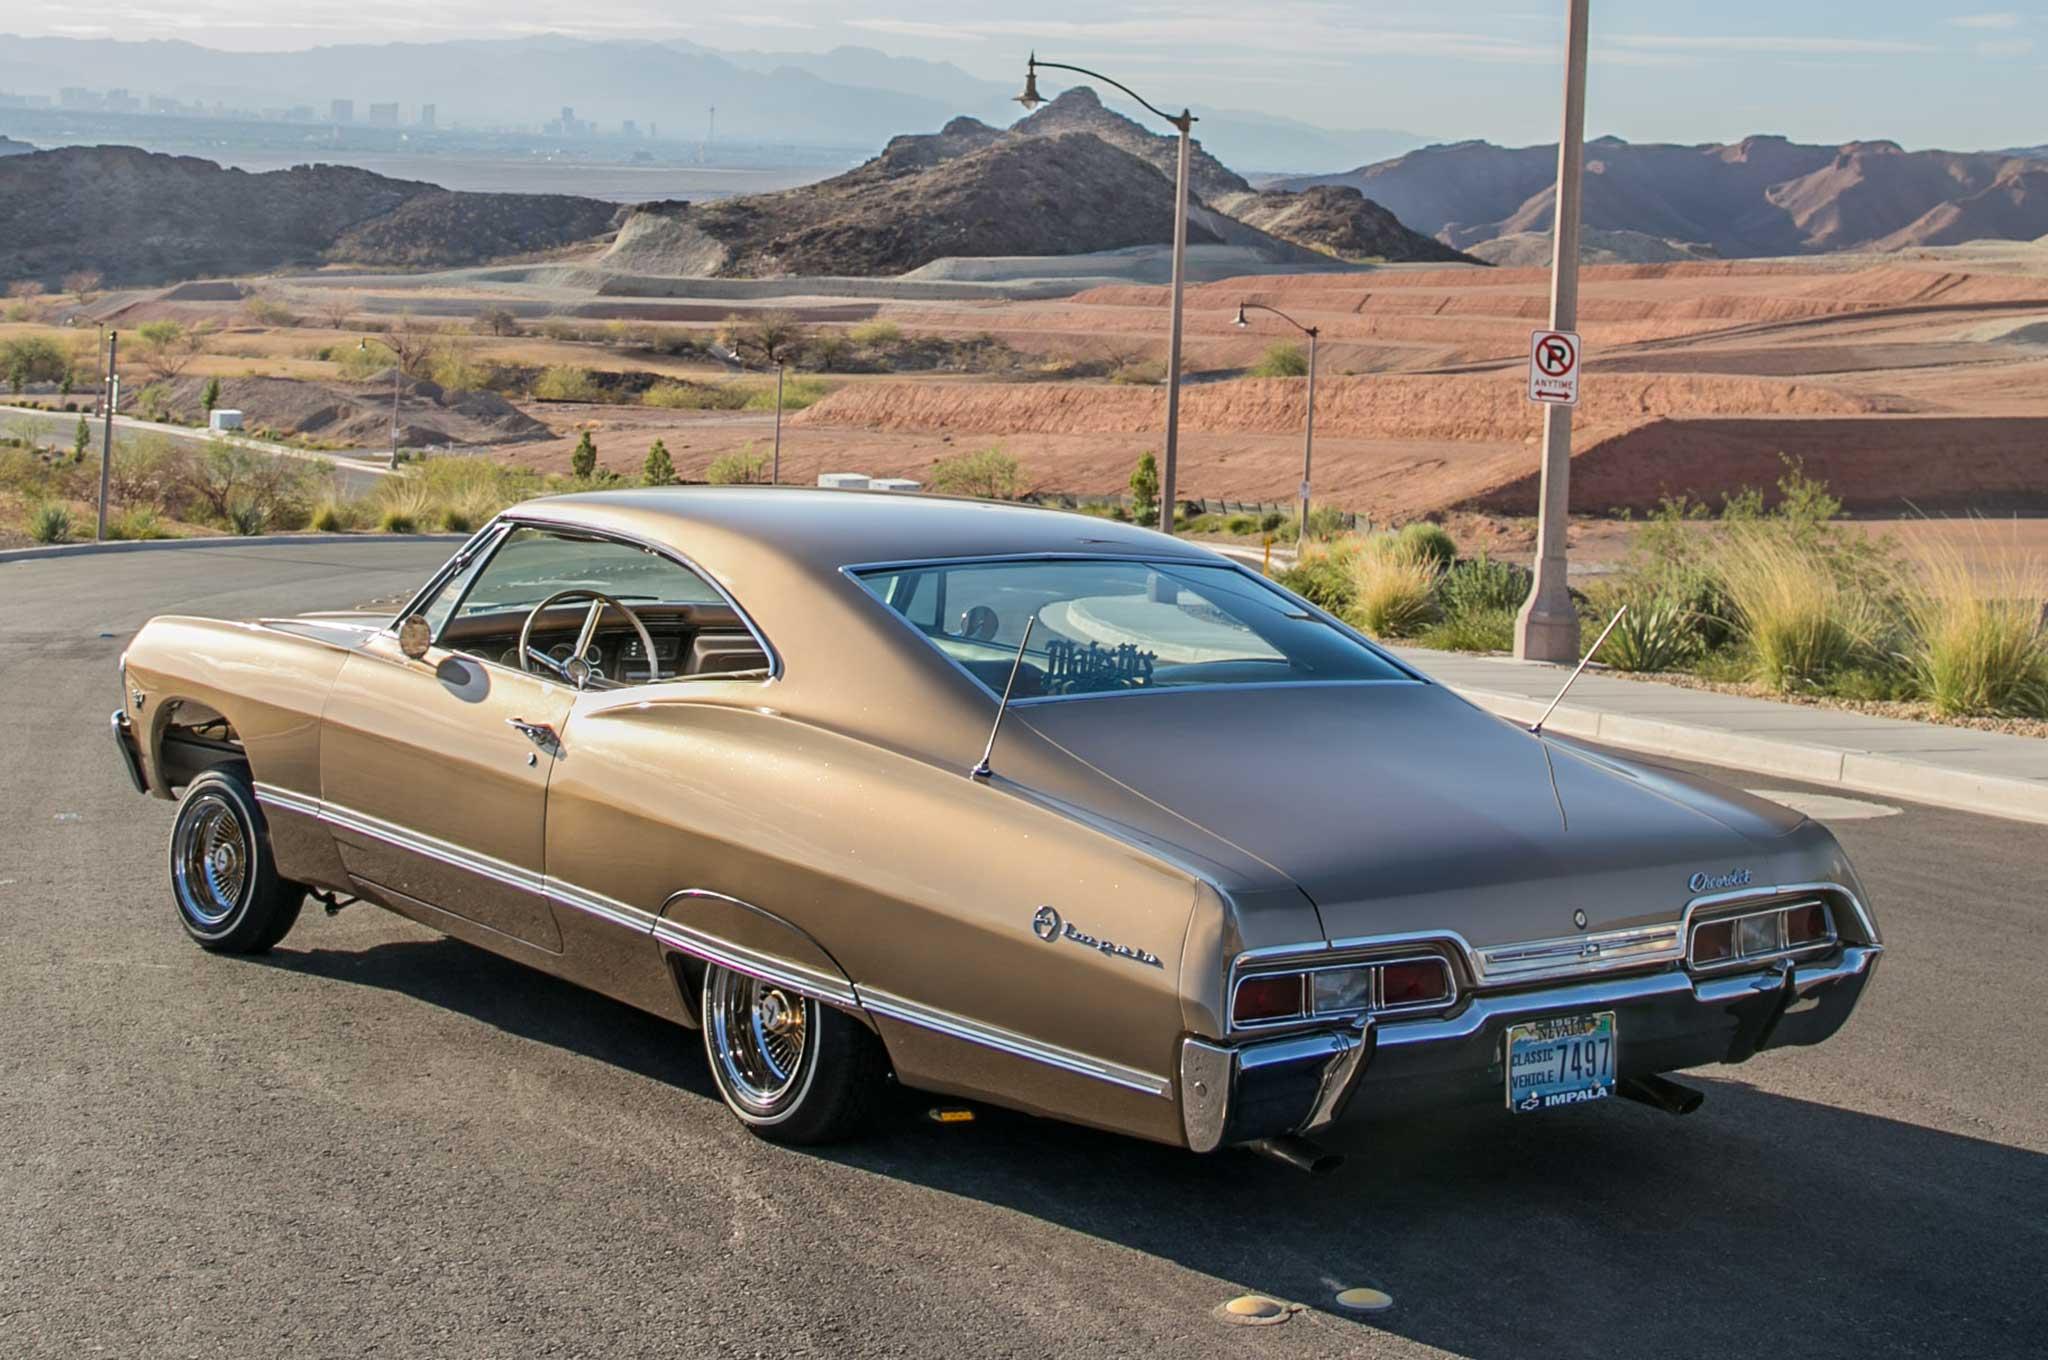 1967 chevrolet impala cesar 39 s palace lowrider. Black Bedroom Furniture Sets. Home Design Ideas